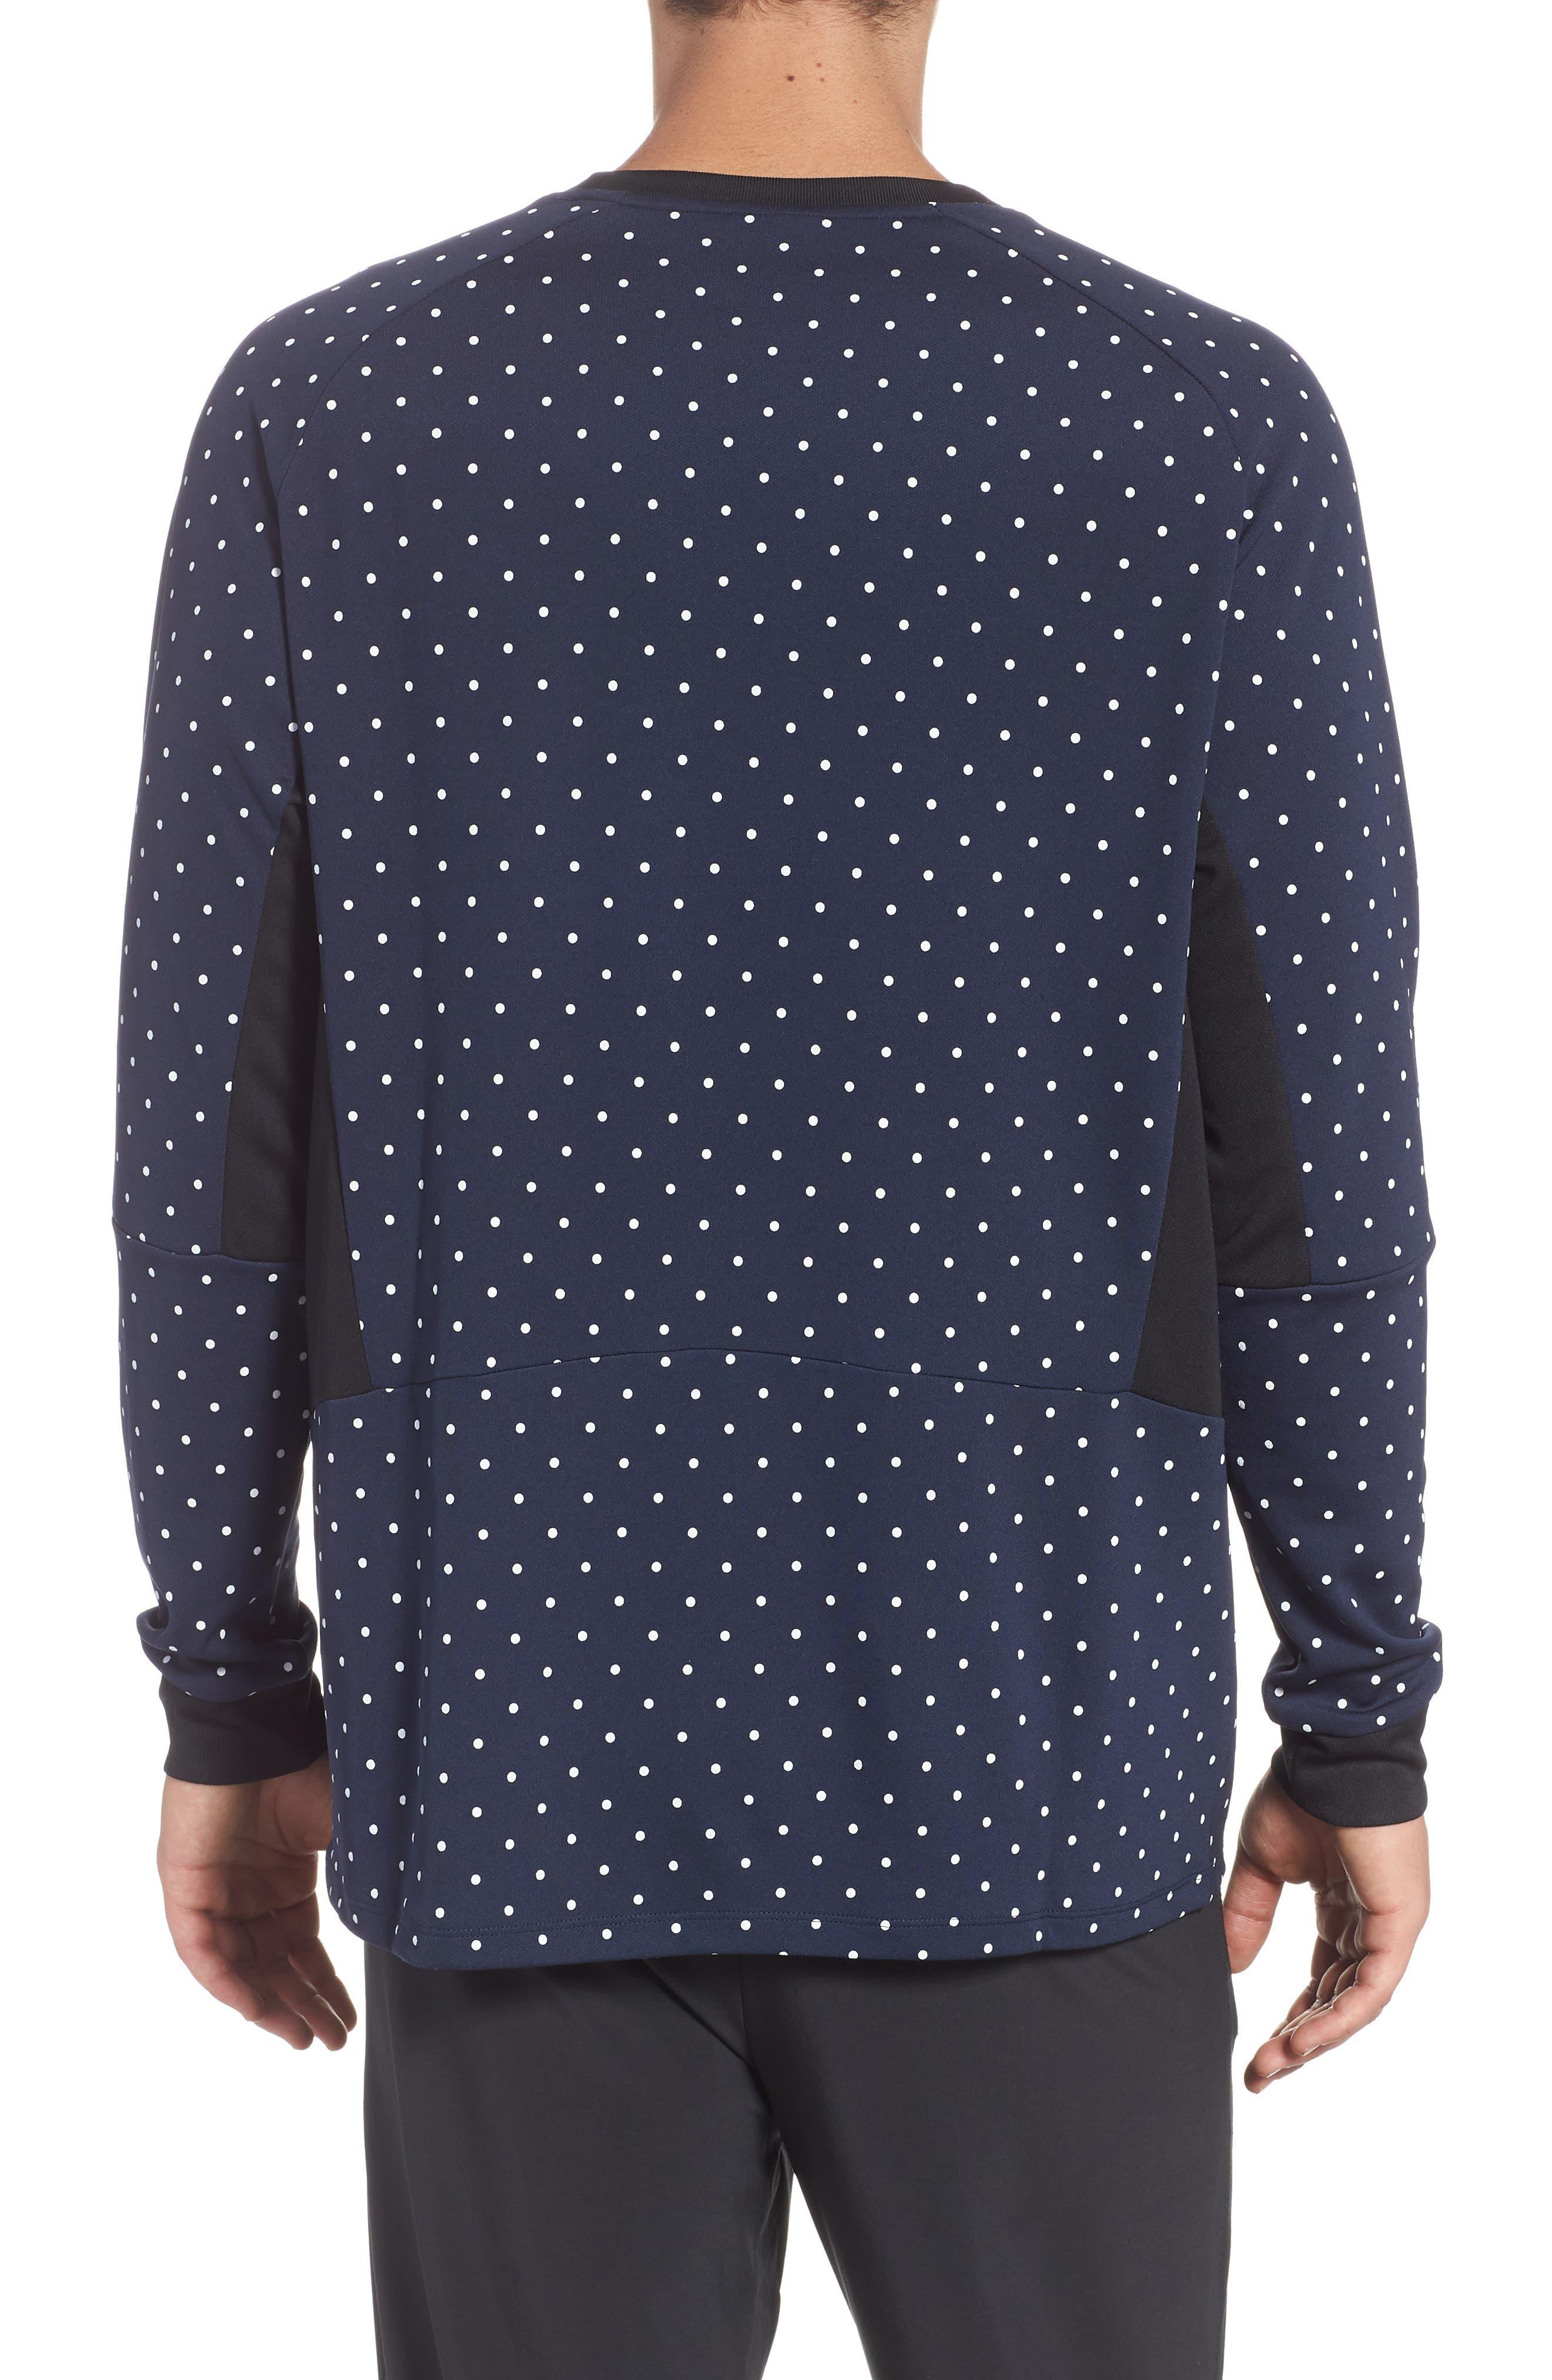 NSW Long Sleeve Shirt,                             Alternate thumbnail 2, color,                             451